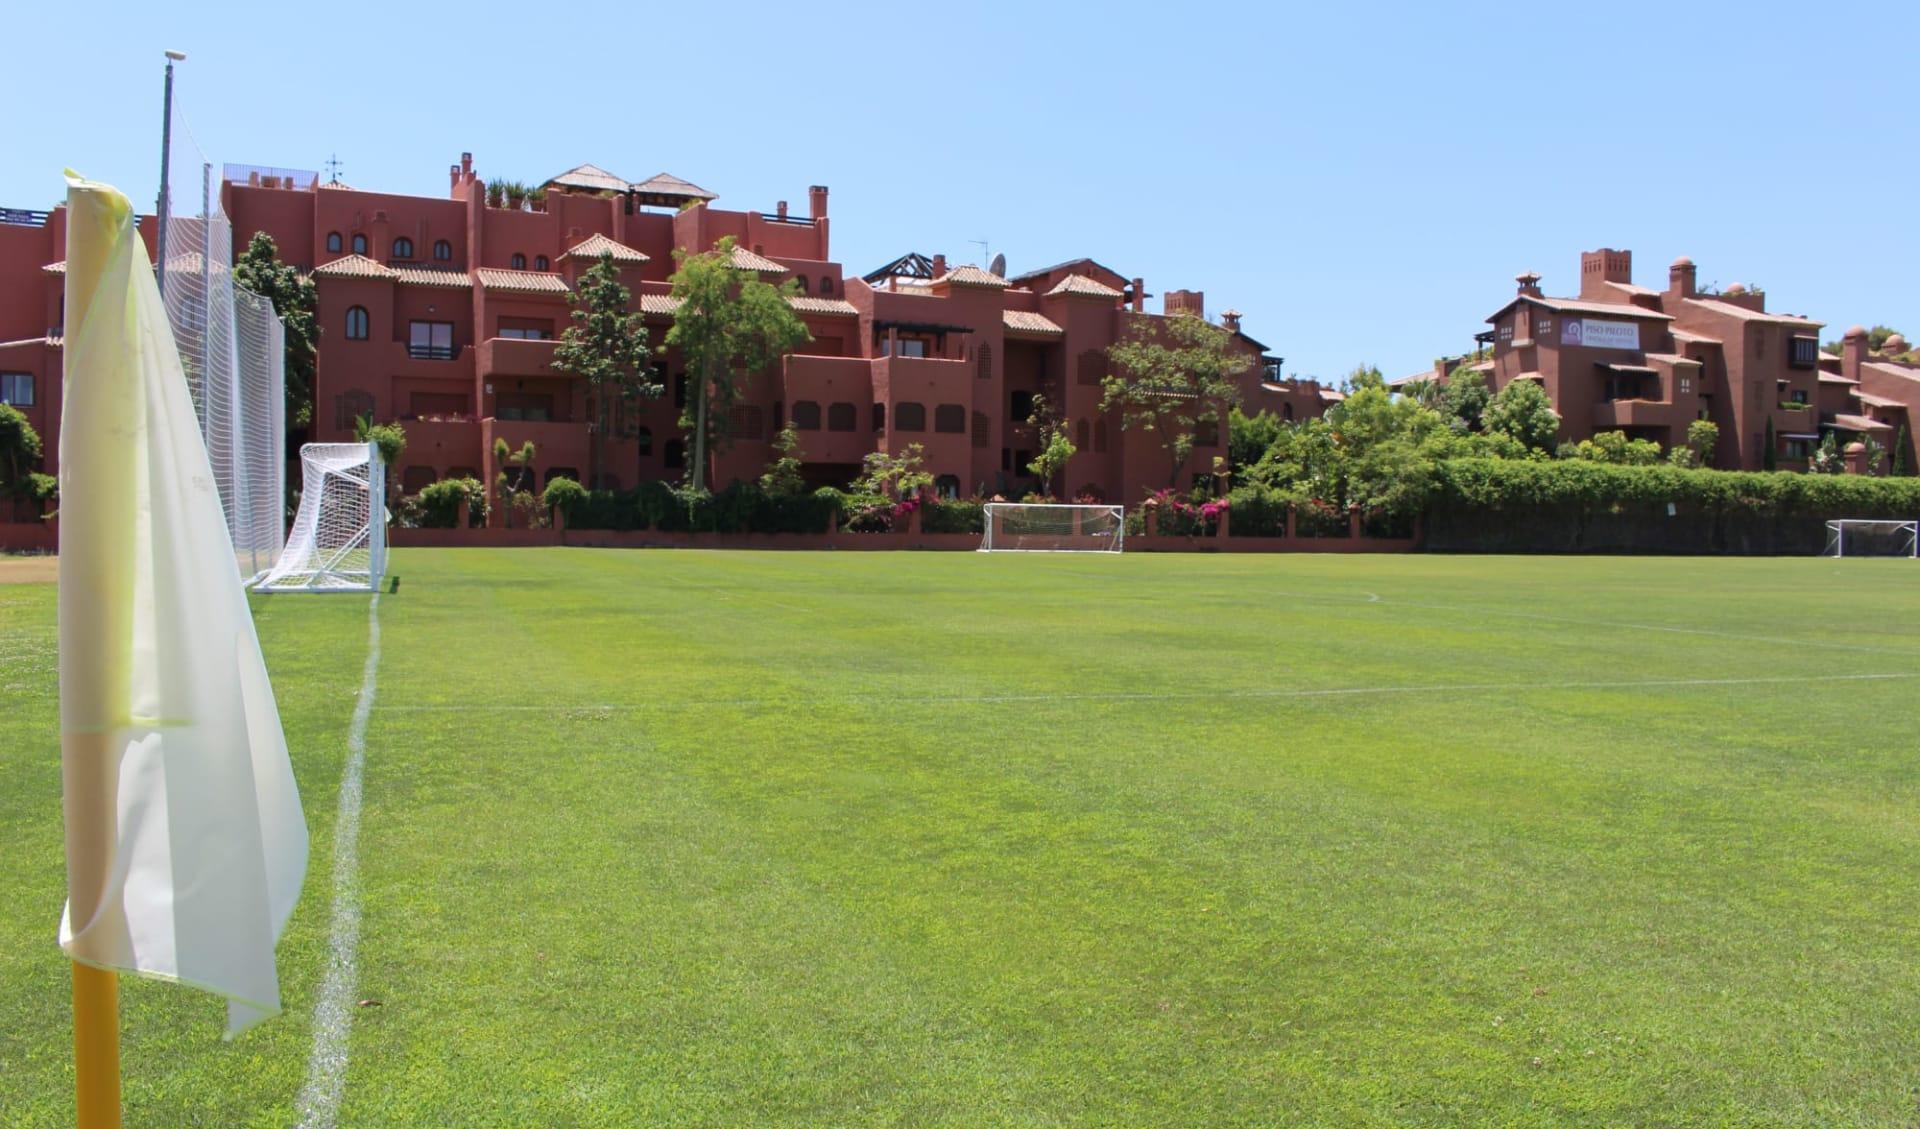 Estepona - Sol Marbella Atalaya Park ab Malaga: A_Atalaya - Fussballplatz